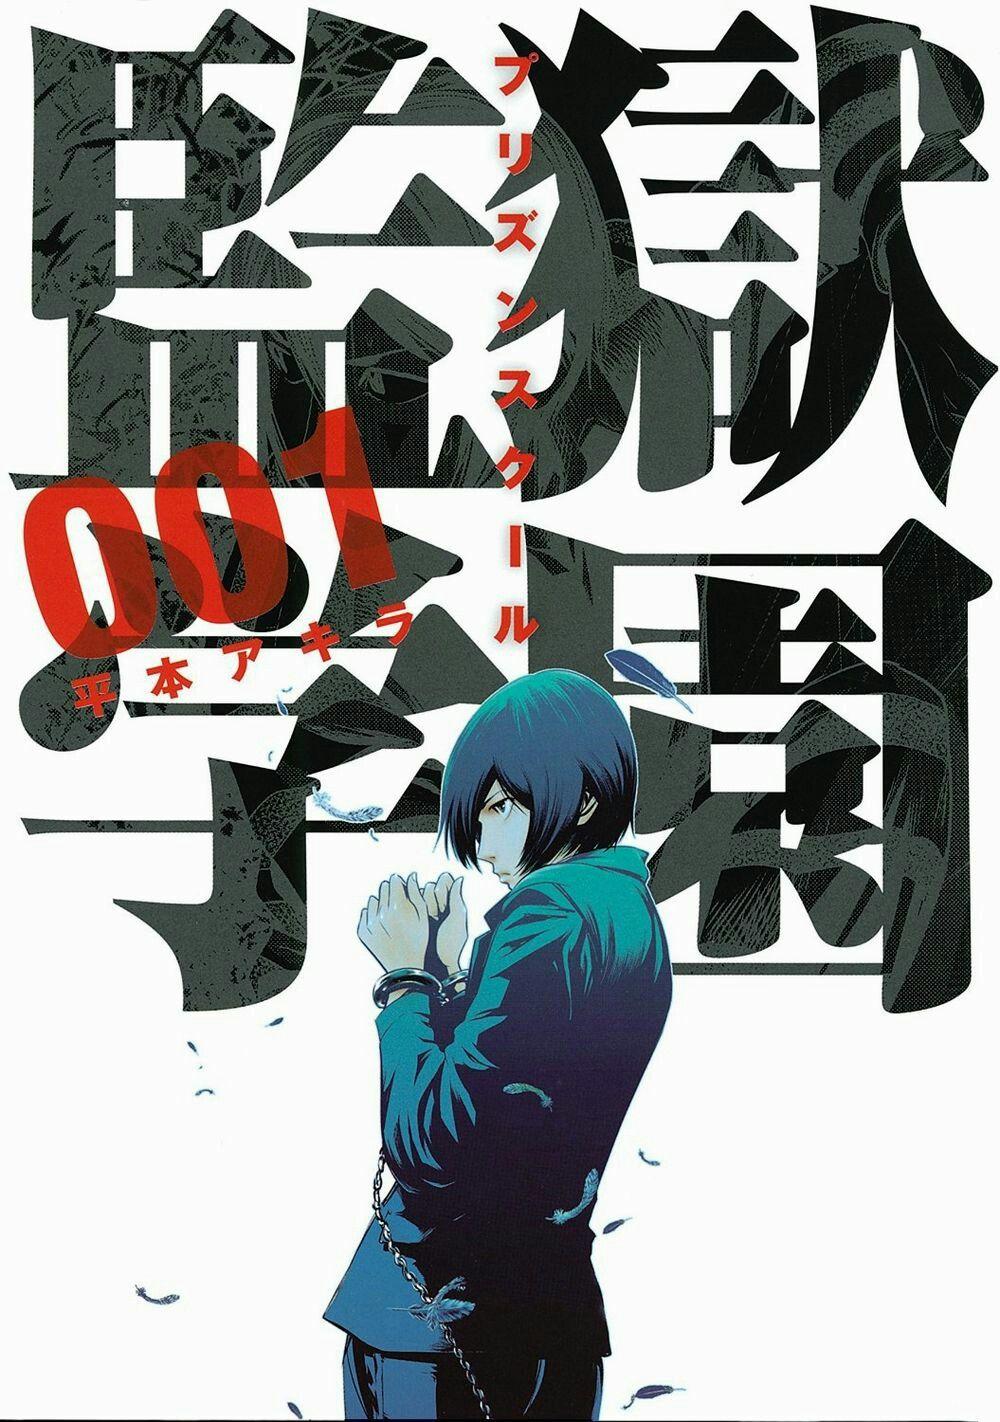 Pin de Madison Ramos em Animes Anime